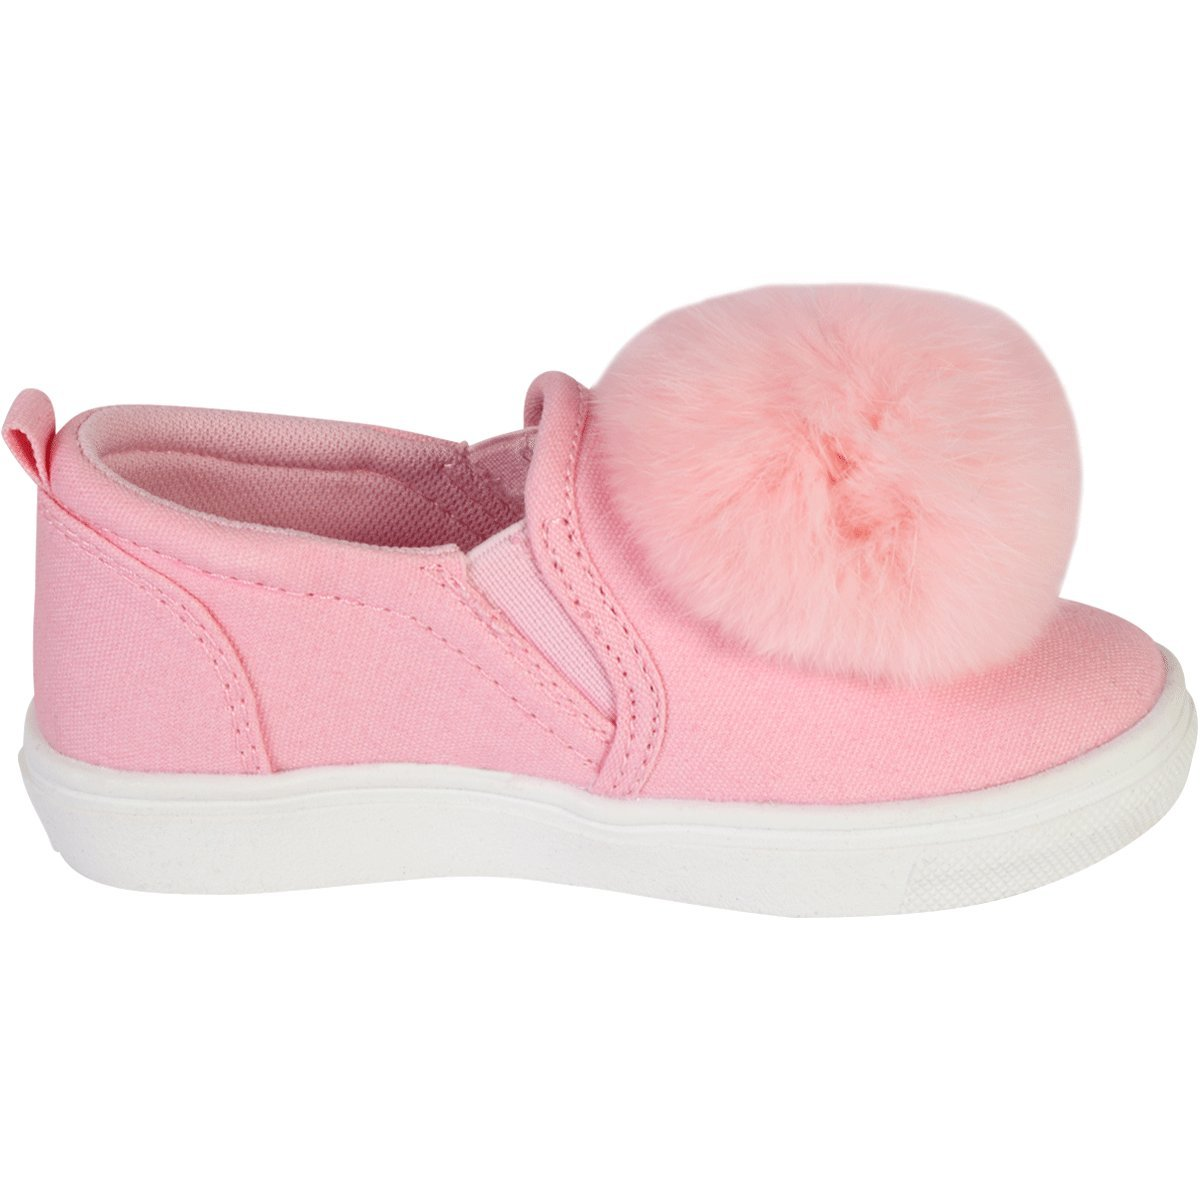 10 M US Toddler Nicole Miller New York Toddler Girls Canvas Slip On Pom Pom Sneakers Pink